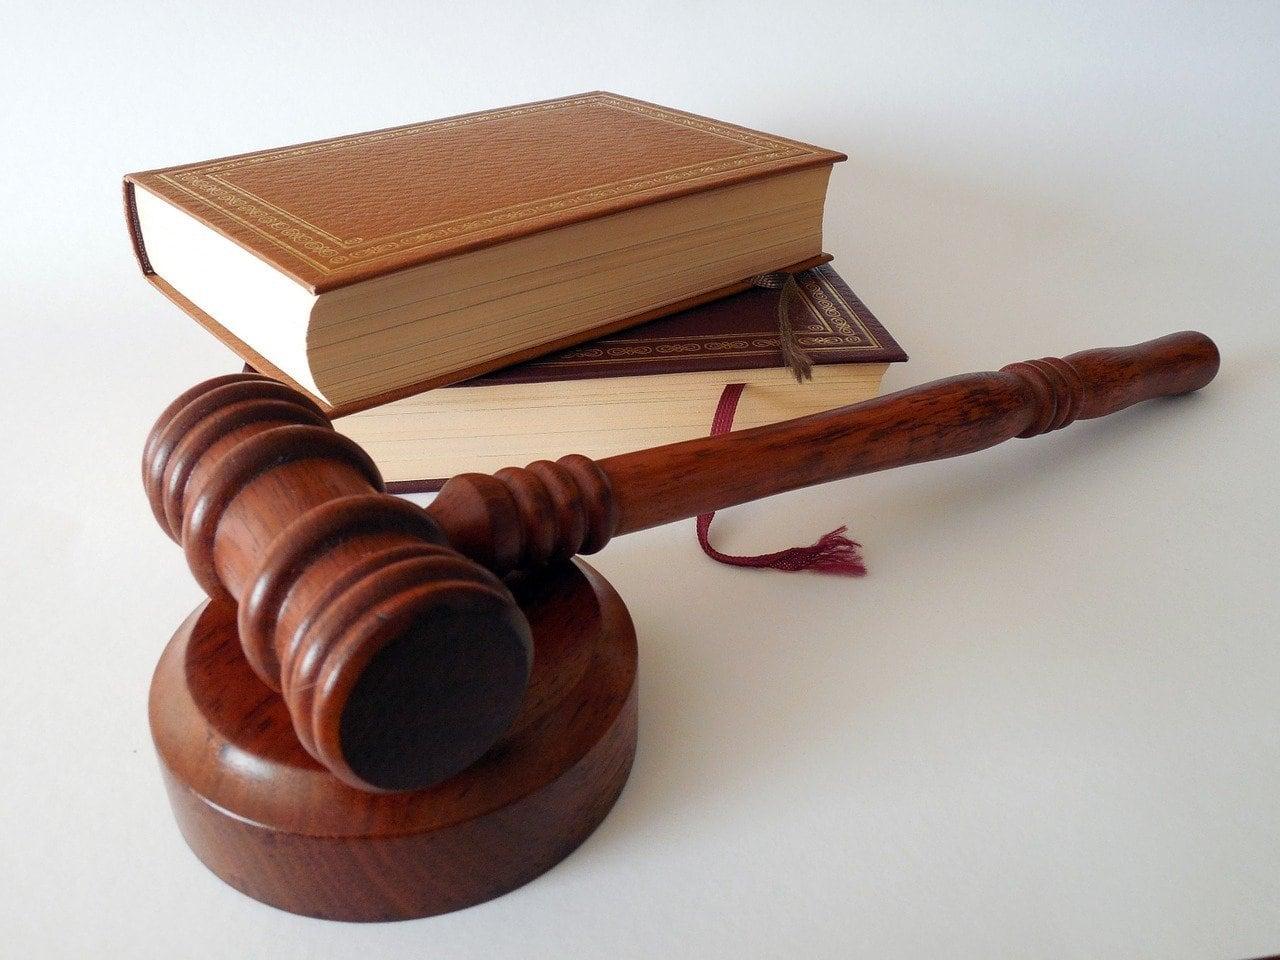 Ilmu Hukum - Jurusan Favorit di USU Medan dan Paling Banyak Peminat Universitas Sumatera Utara